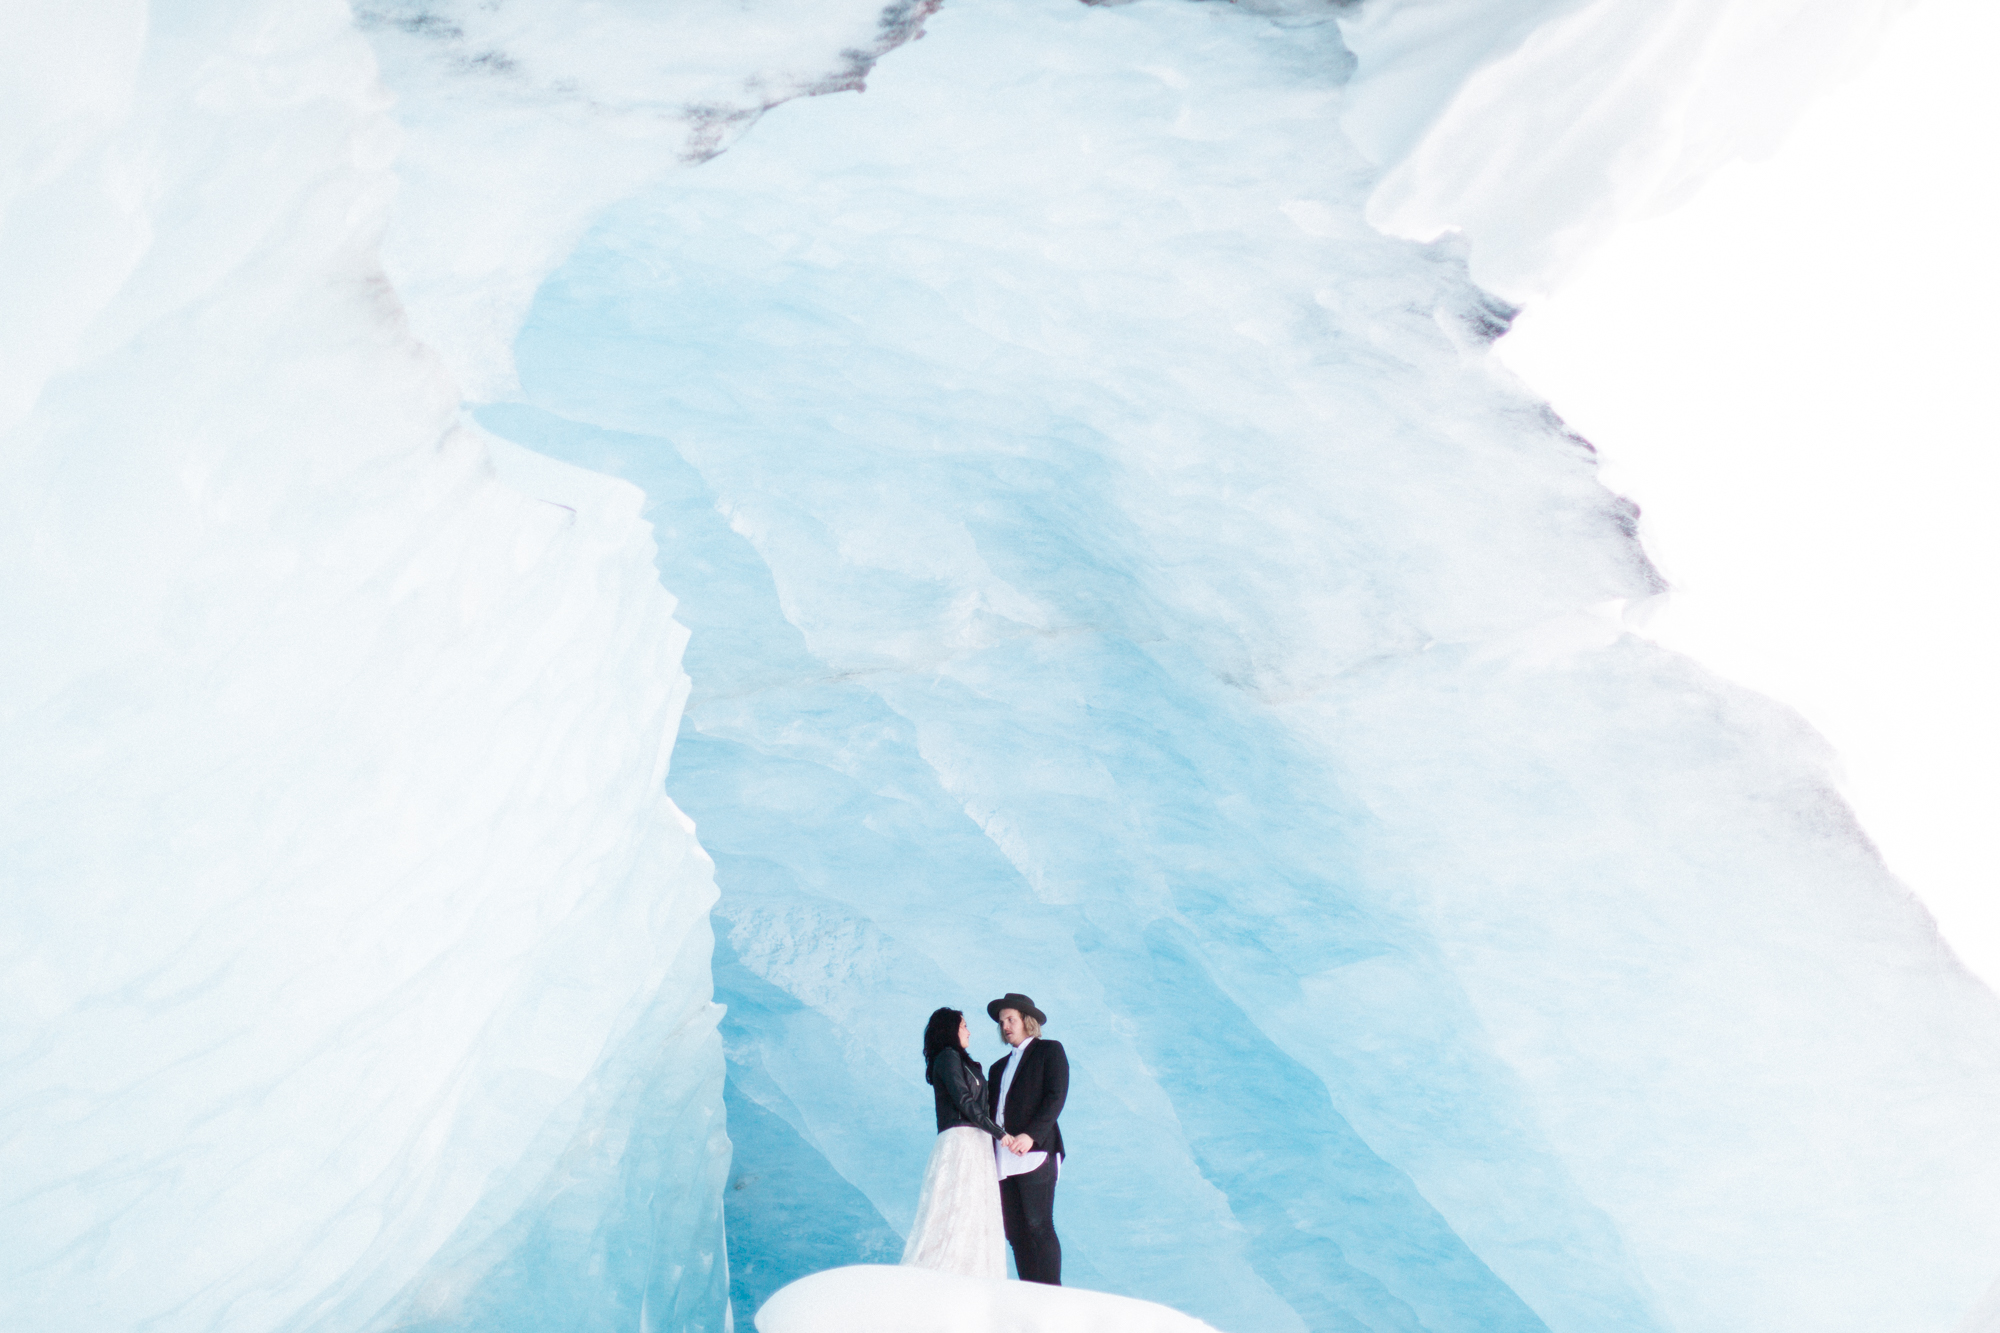 Jasper-elopement-wedding-photography-23.jpg